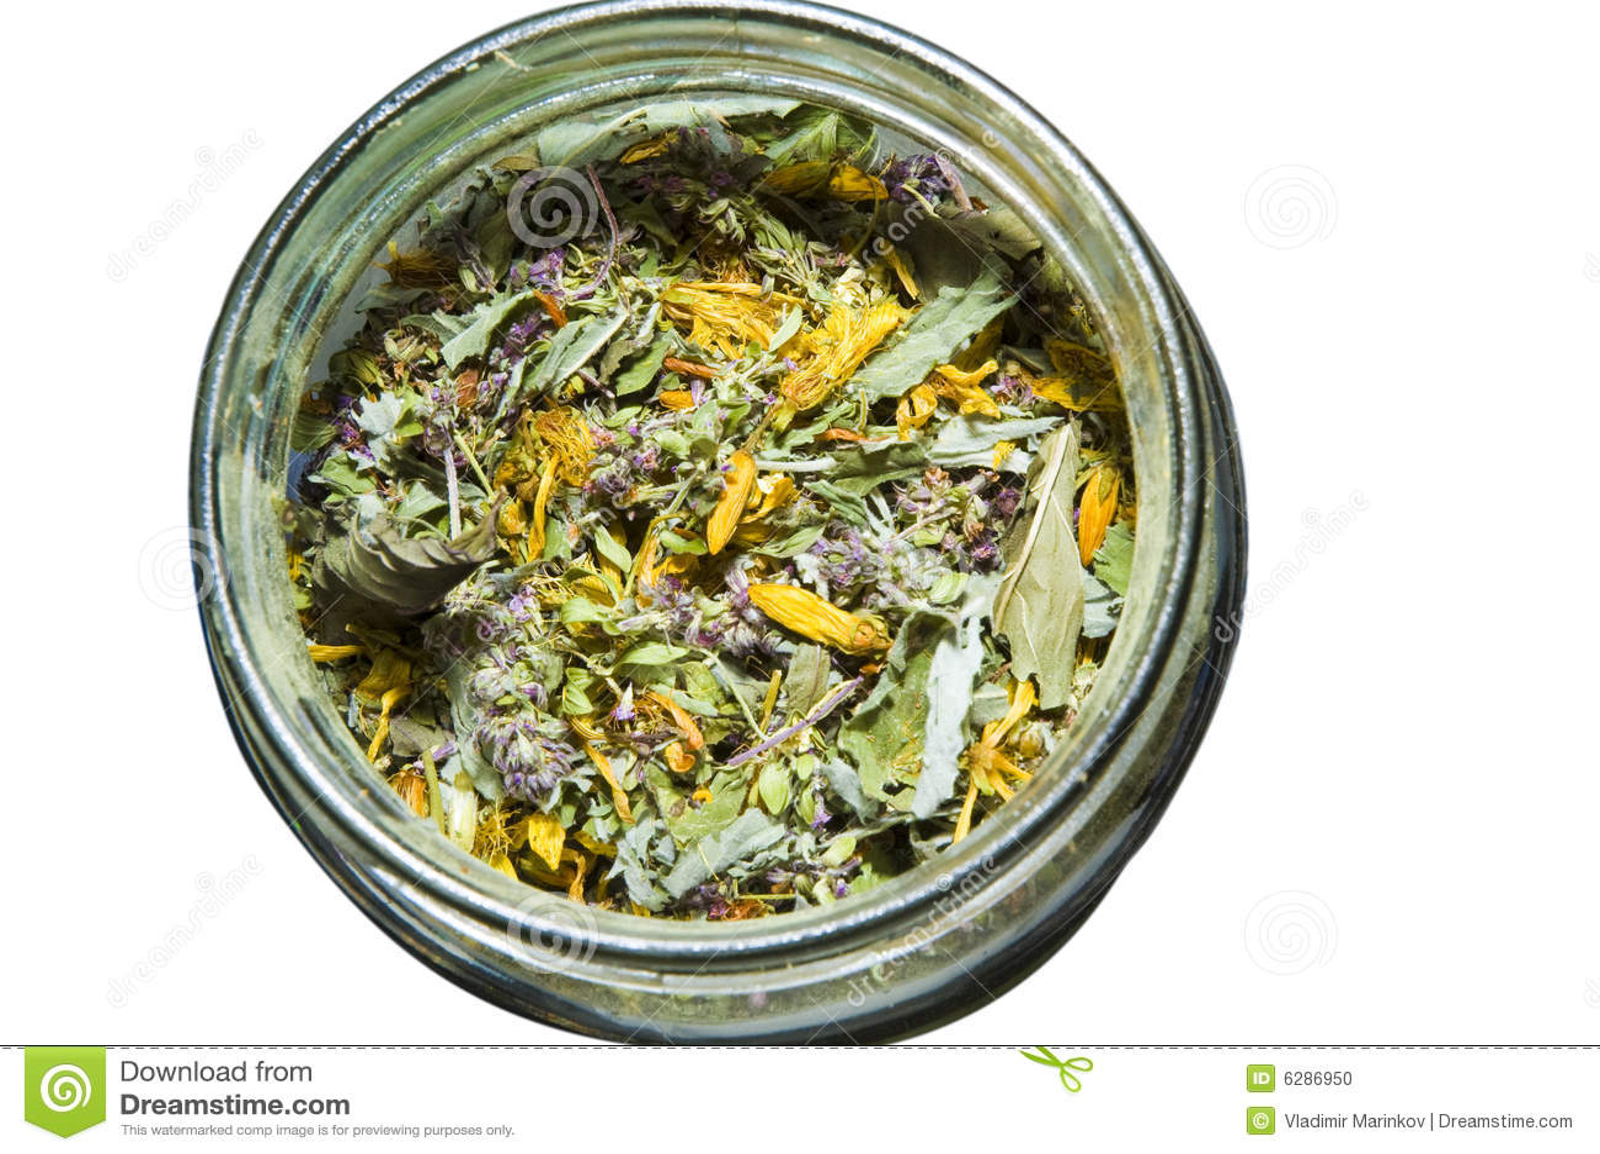 Tea in a Jar